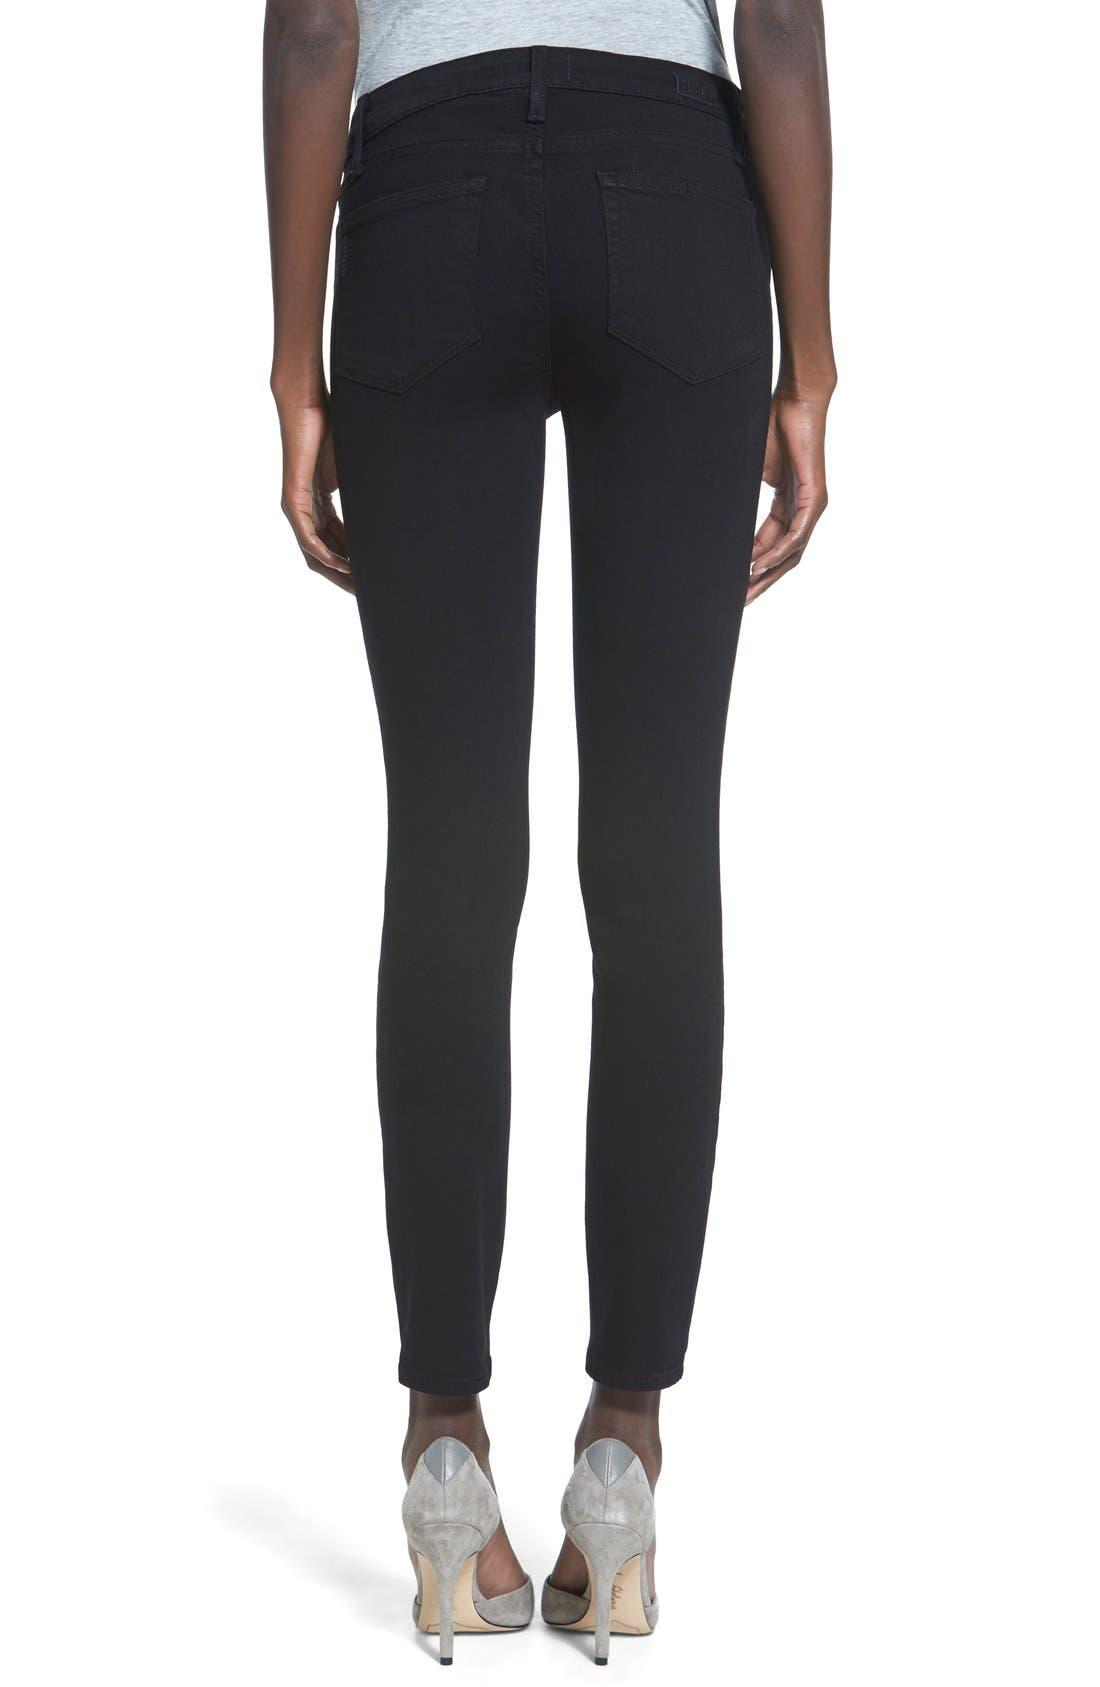 Transcend - Verdugo Ankle Ultra Skinny Jeans,                             Alternate thumbnail 9, color,                             BLACK SHADOW